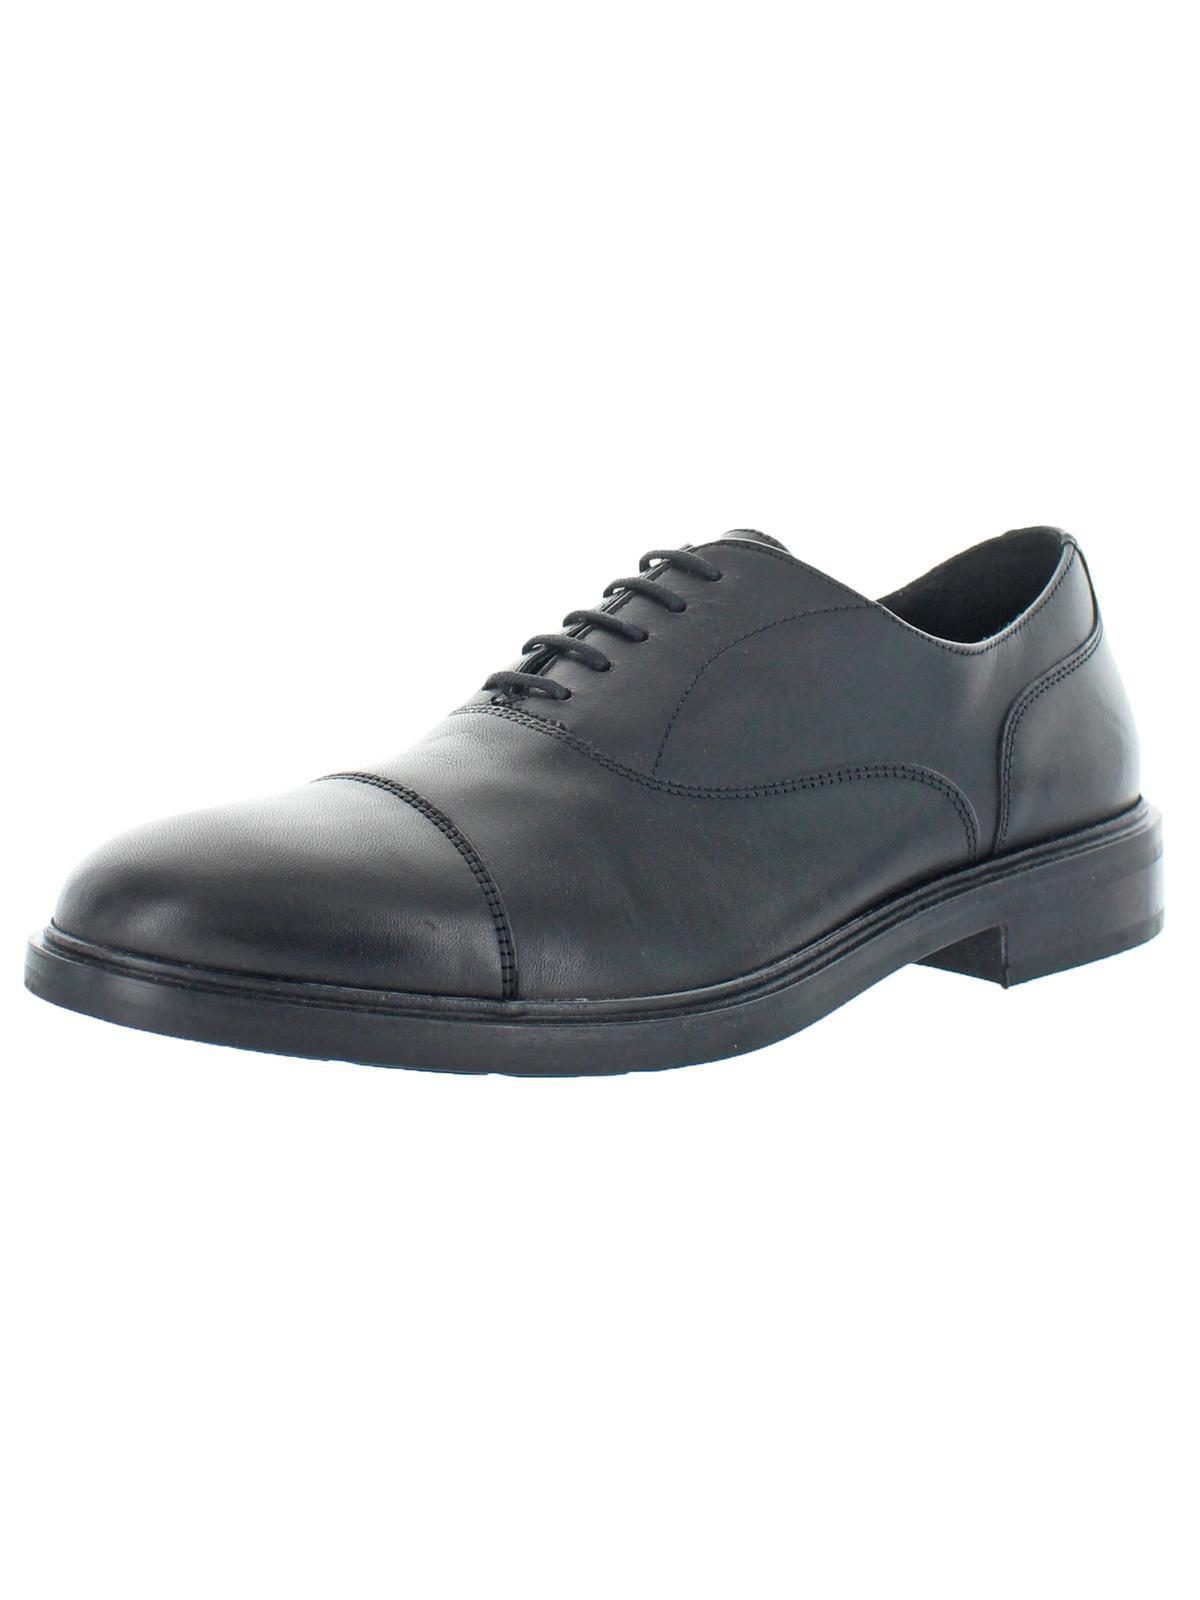 segundo Sobrio Acorazado  Geox - Geox Respira Mens Curtwain Leather Lace Up Cap Toe Oxfords -  Walmart.com - Walmart.com